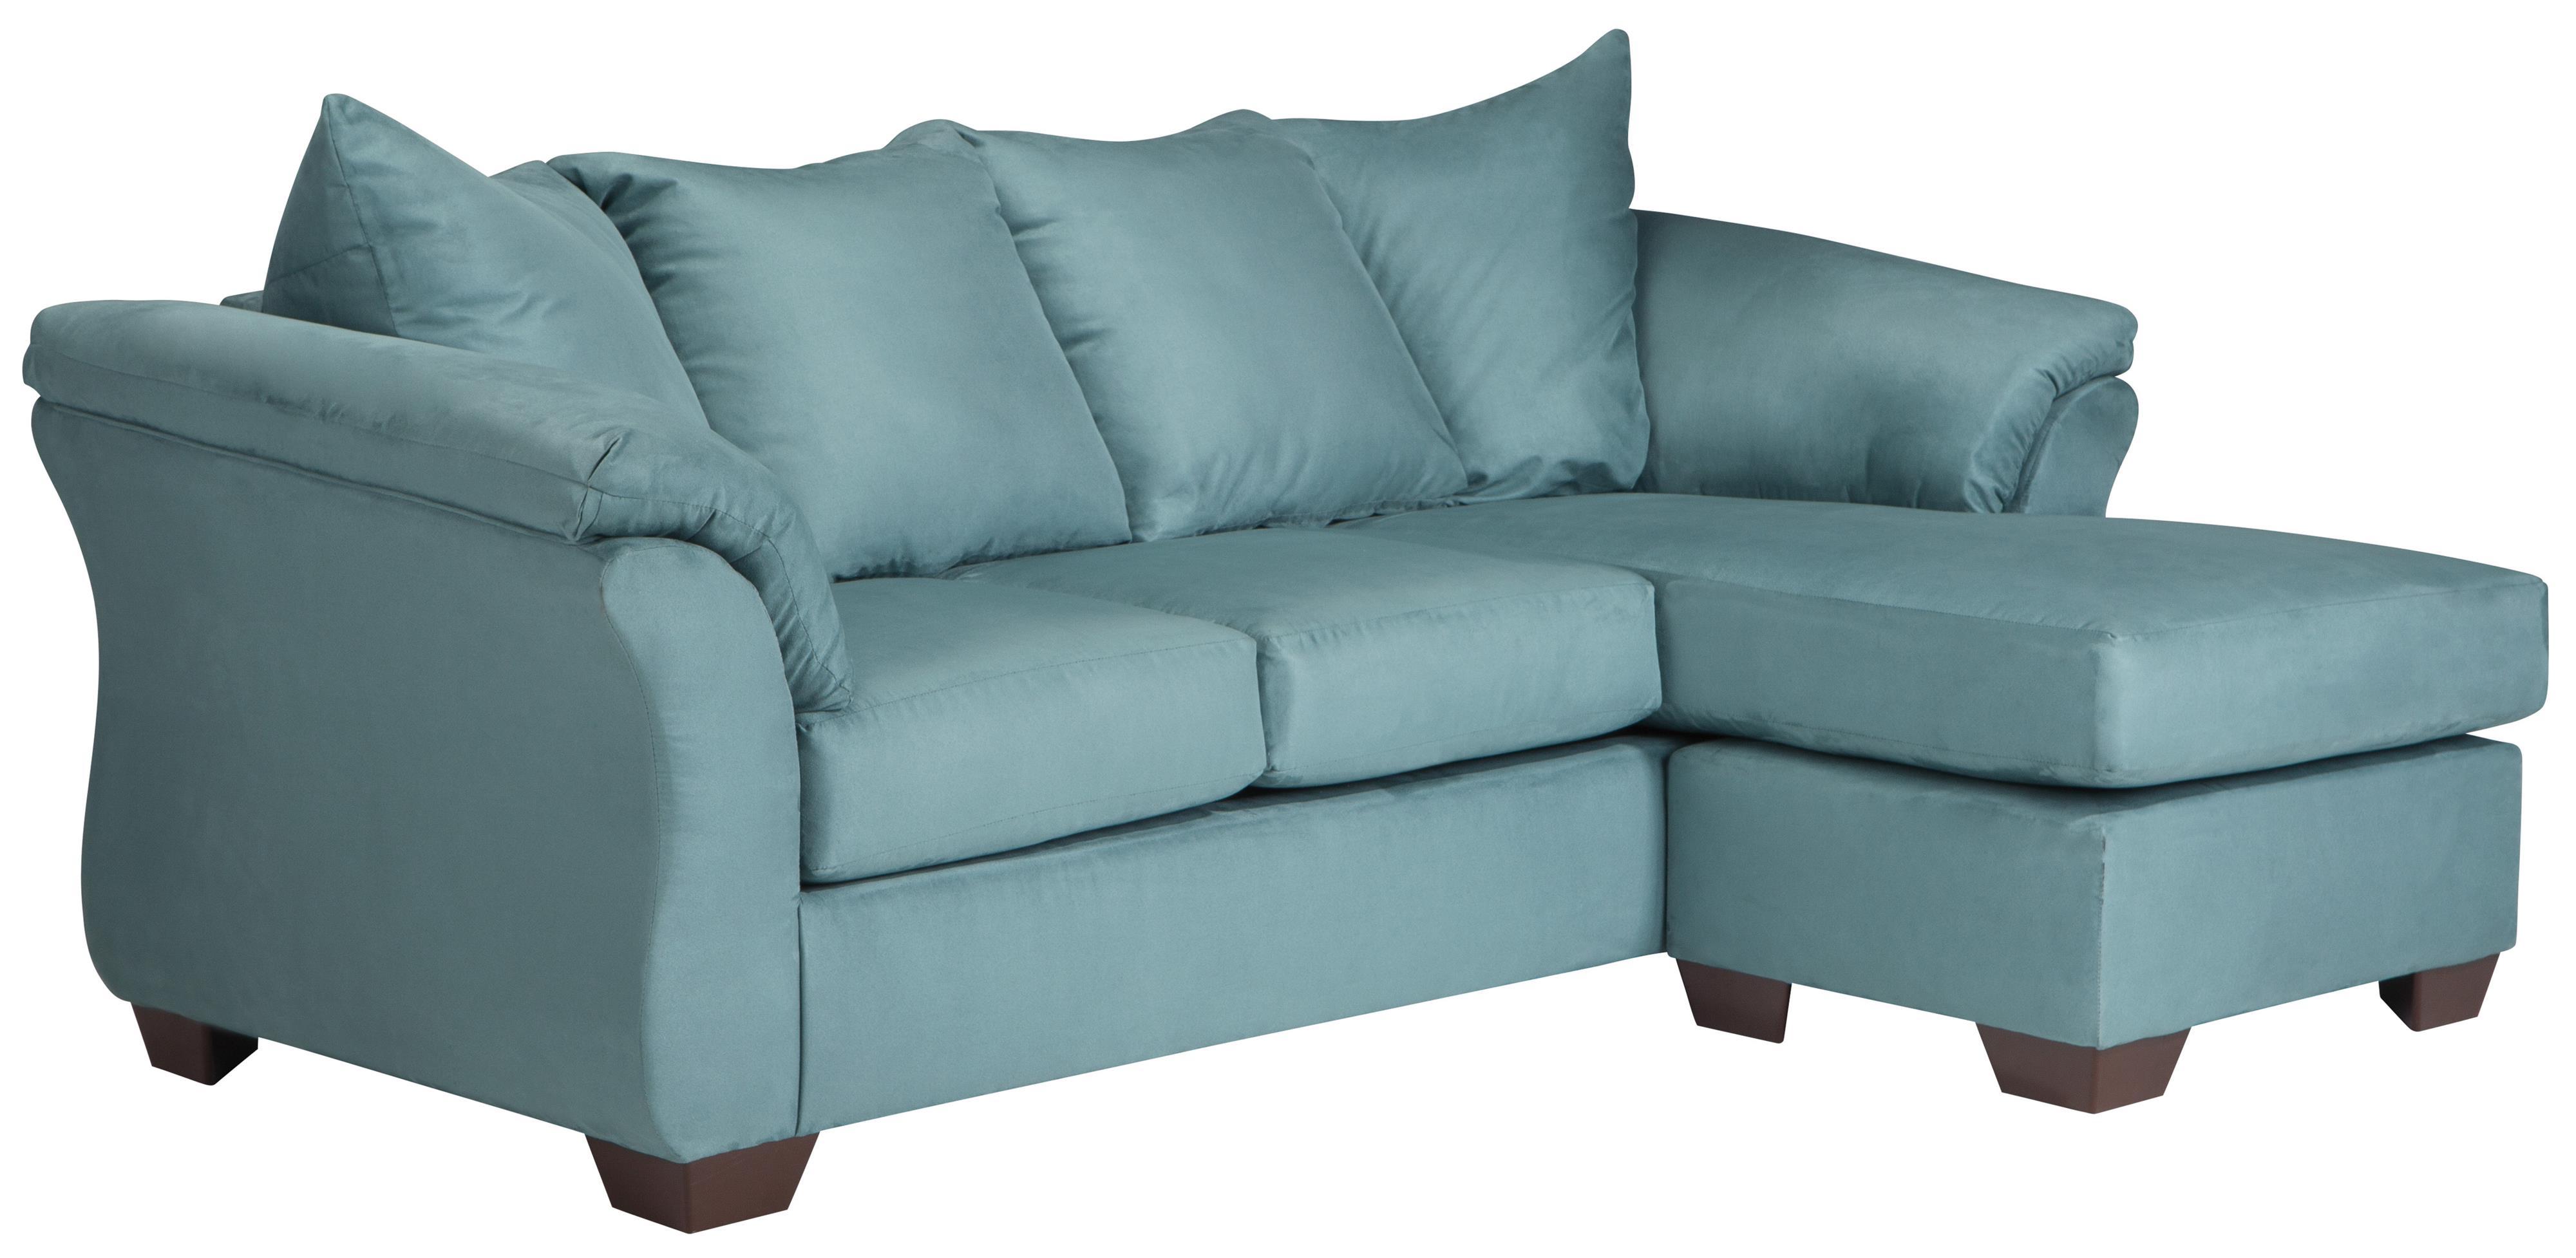 Ashley signature design darcy sky 7500618 contemporary for Chaises design colorees